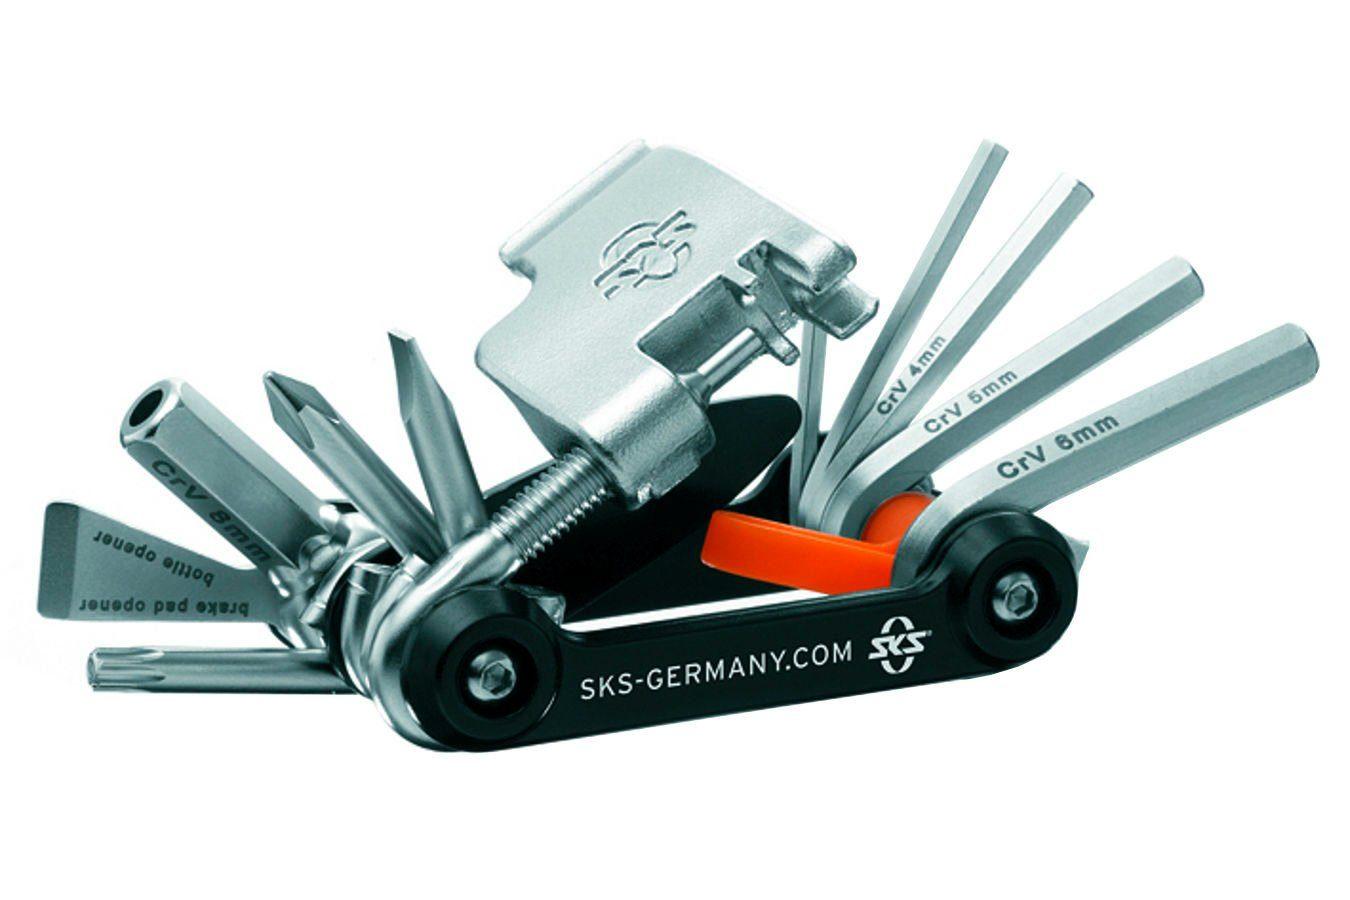 SKS Werkzeug & Montage »Tom 18 Multitool«